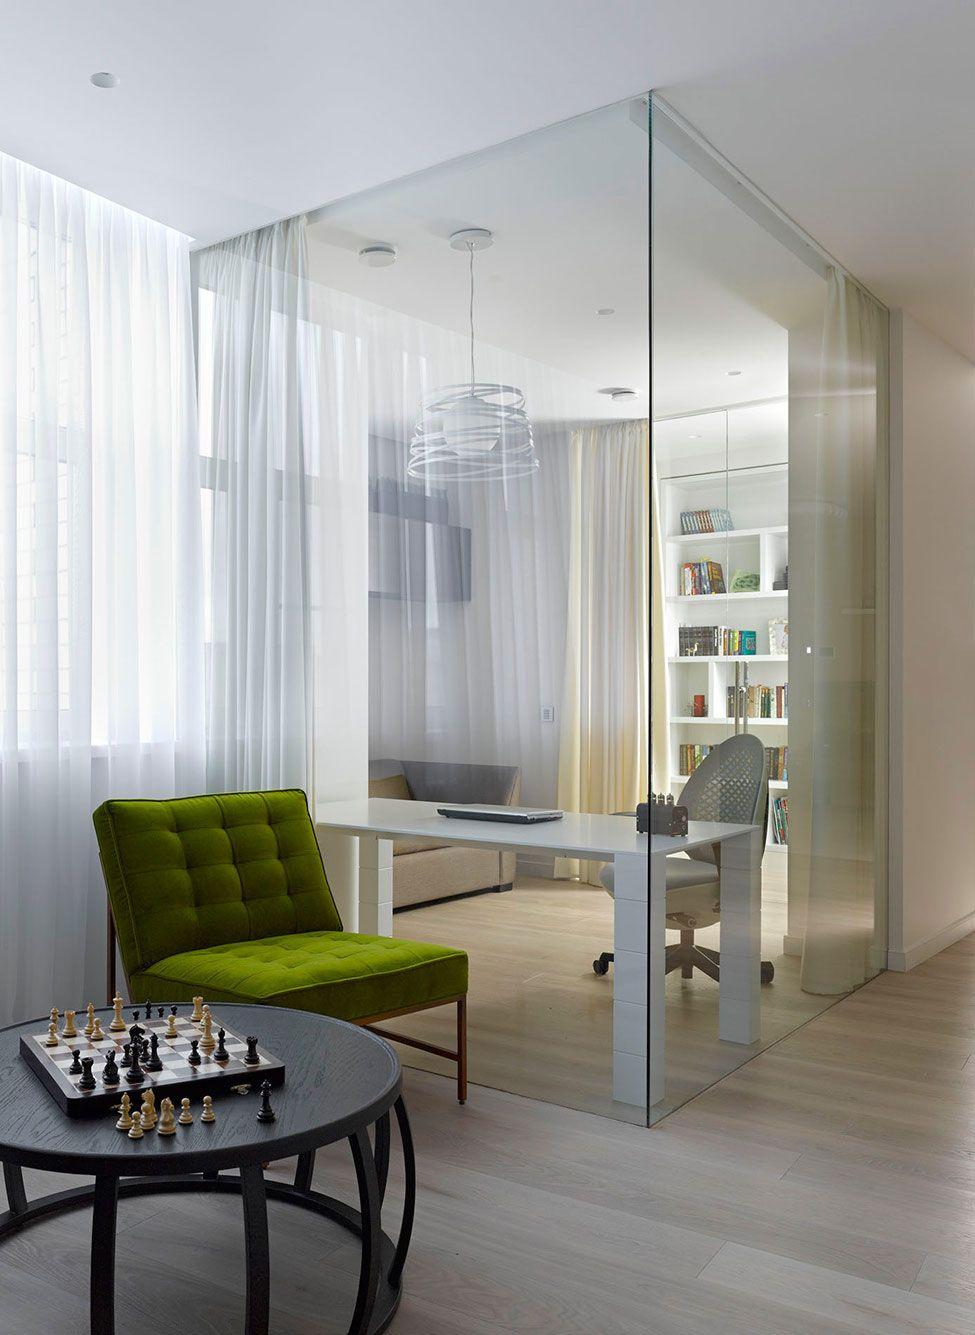 Room Ideas Luxury Apartment Design By Alexandra Fedorova: Apartment On Alexander Nevsky St By Alexandra Fedorova (25